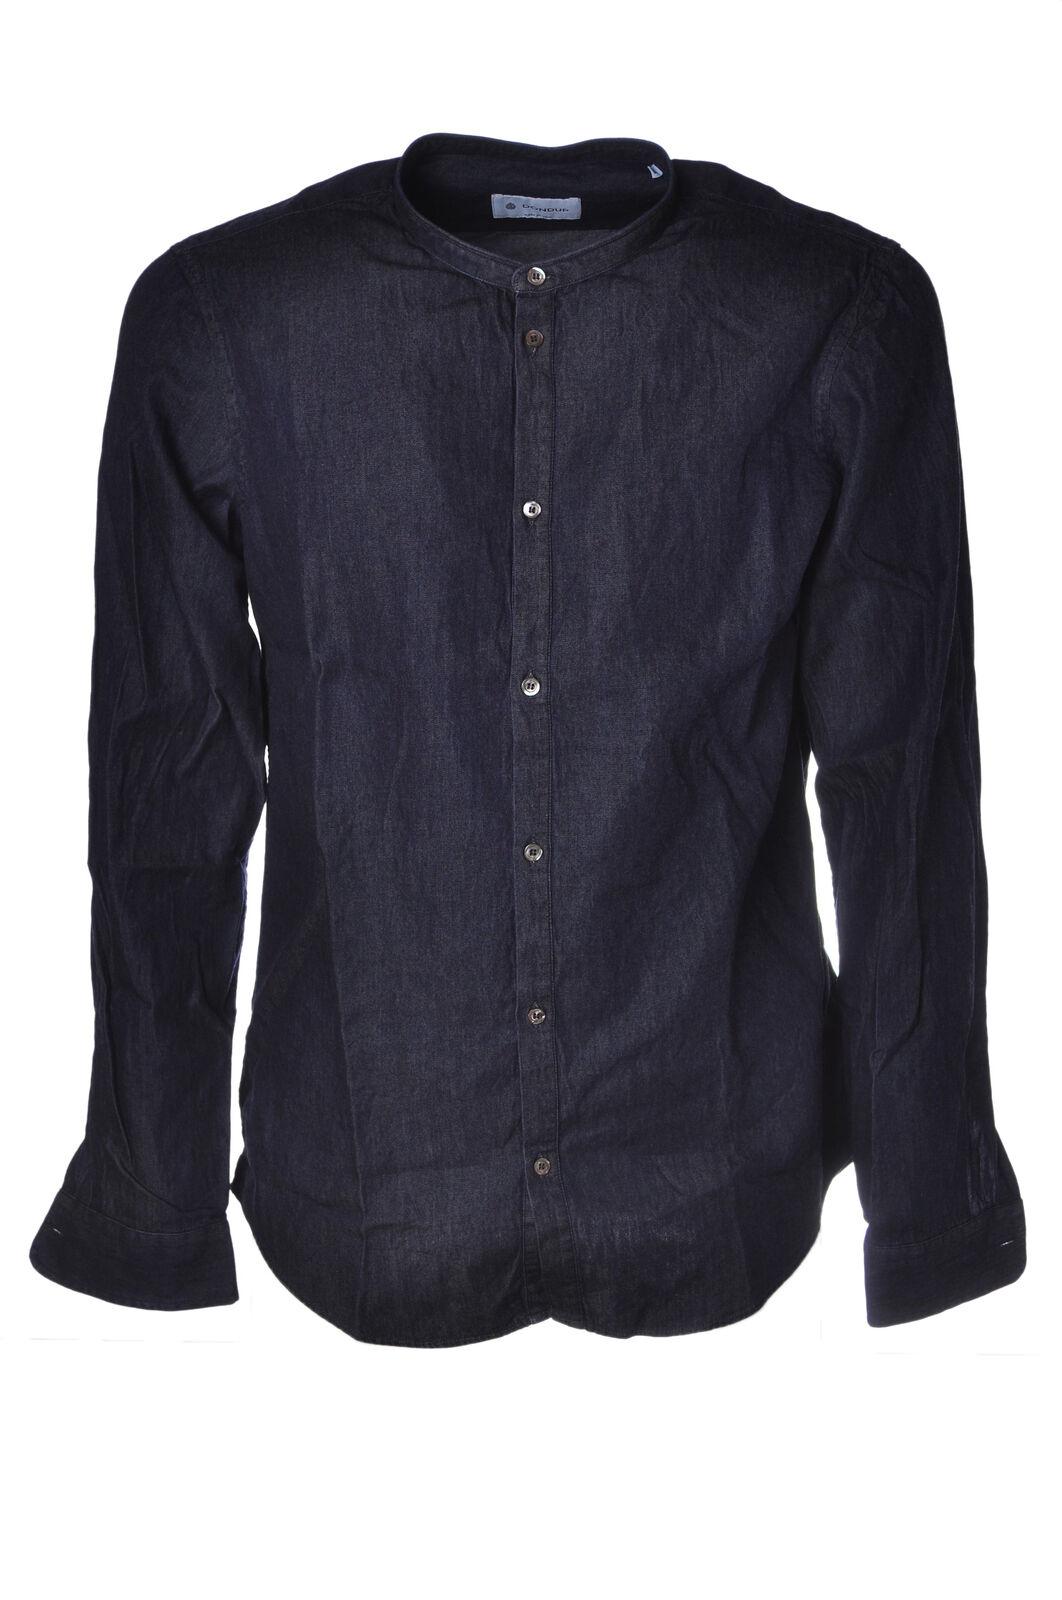 Dondup - Shirts, Shirts, Korean - damen - Dril de algodón - 4534812B183332